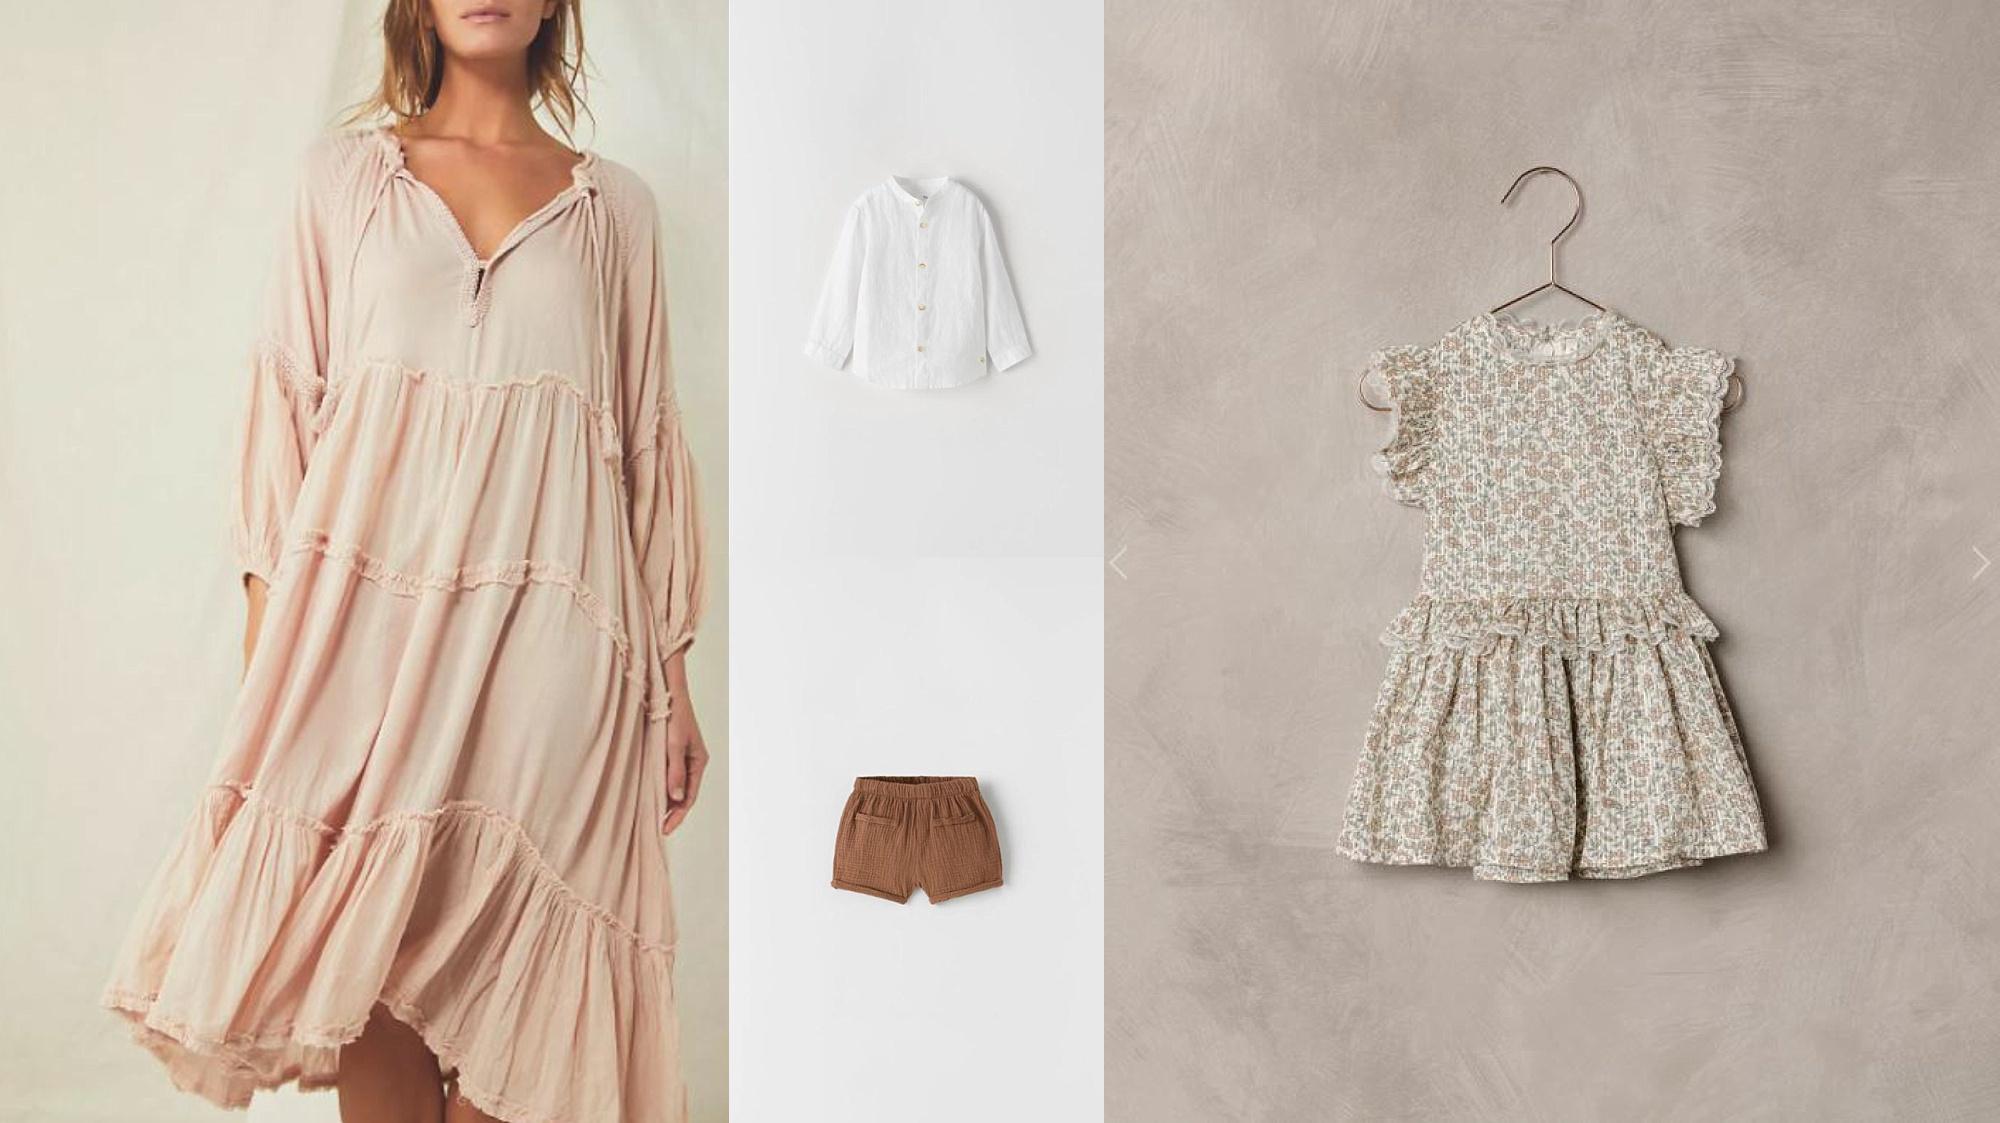 Spring 2021 Wardrobe Ideas